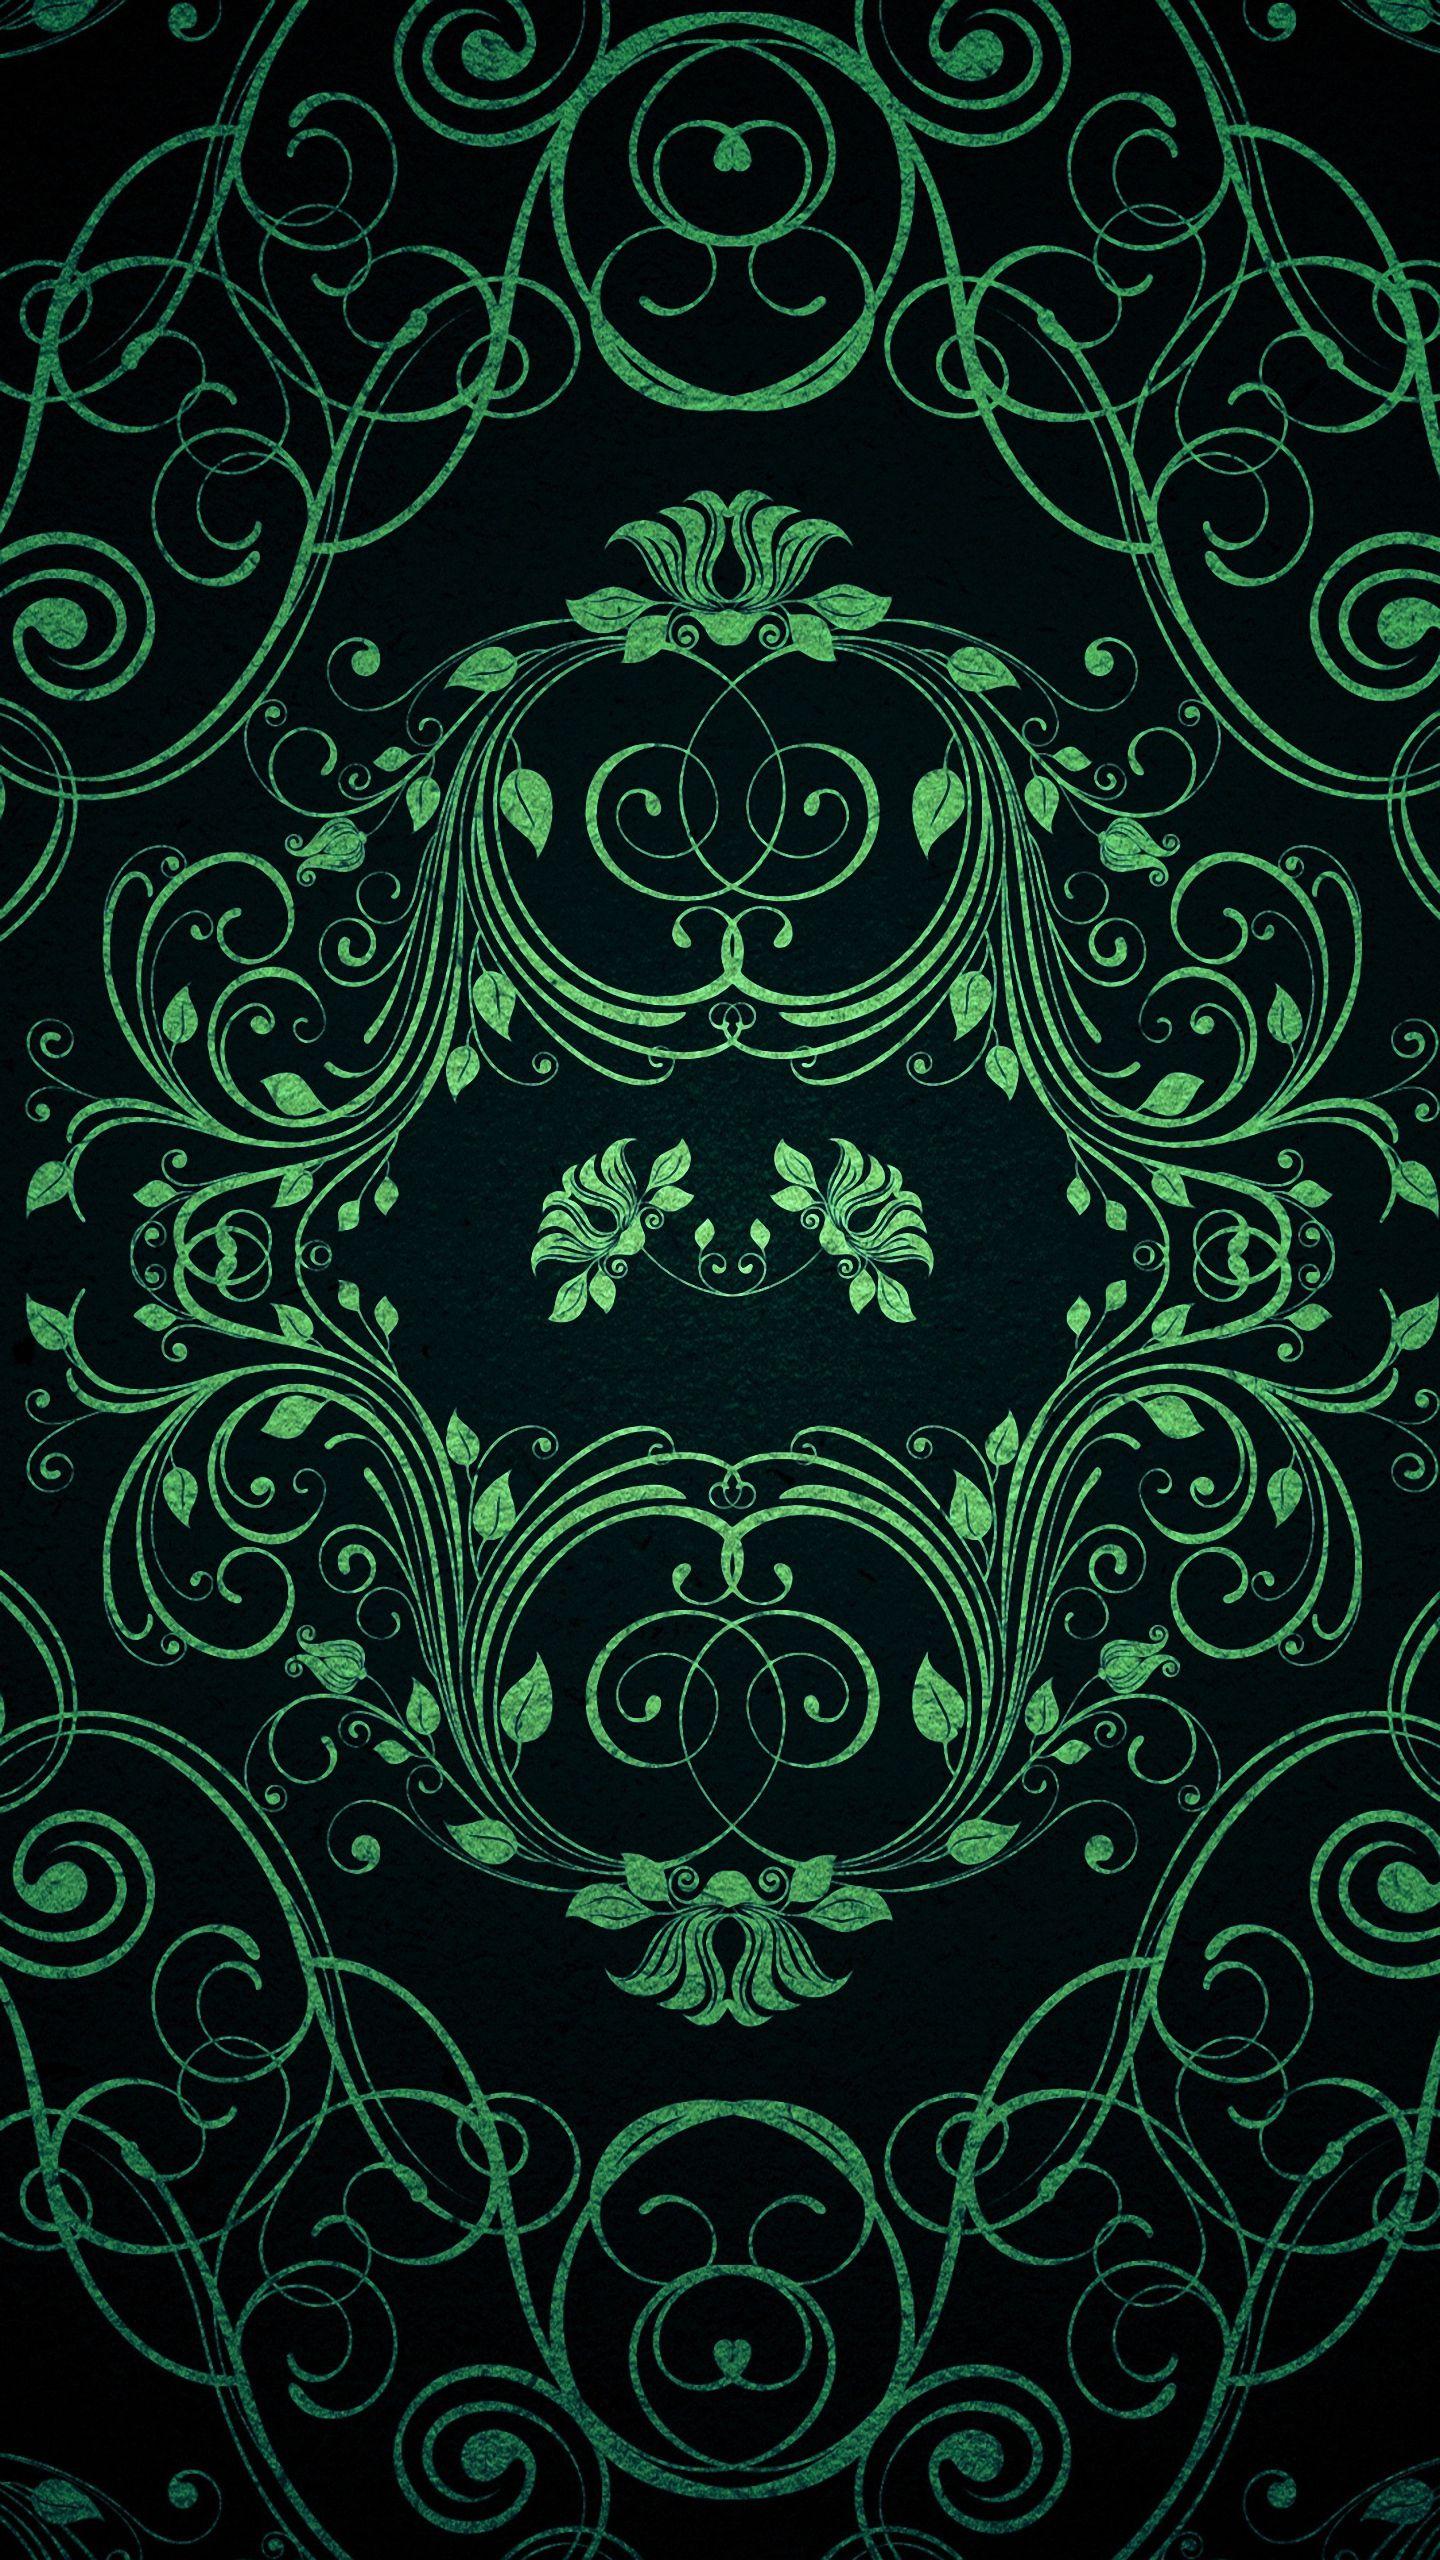 1440x2560 Resolution Images Dark Line Pattern Lg G4 Wallpapers Hd 1440x2560 Line Patterns Wallpaper Pattern